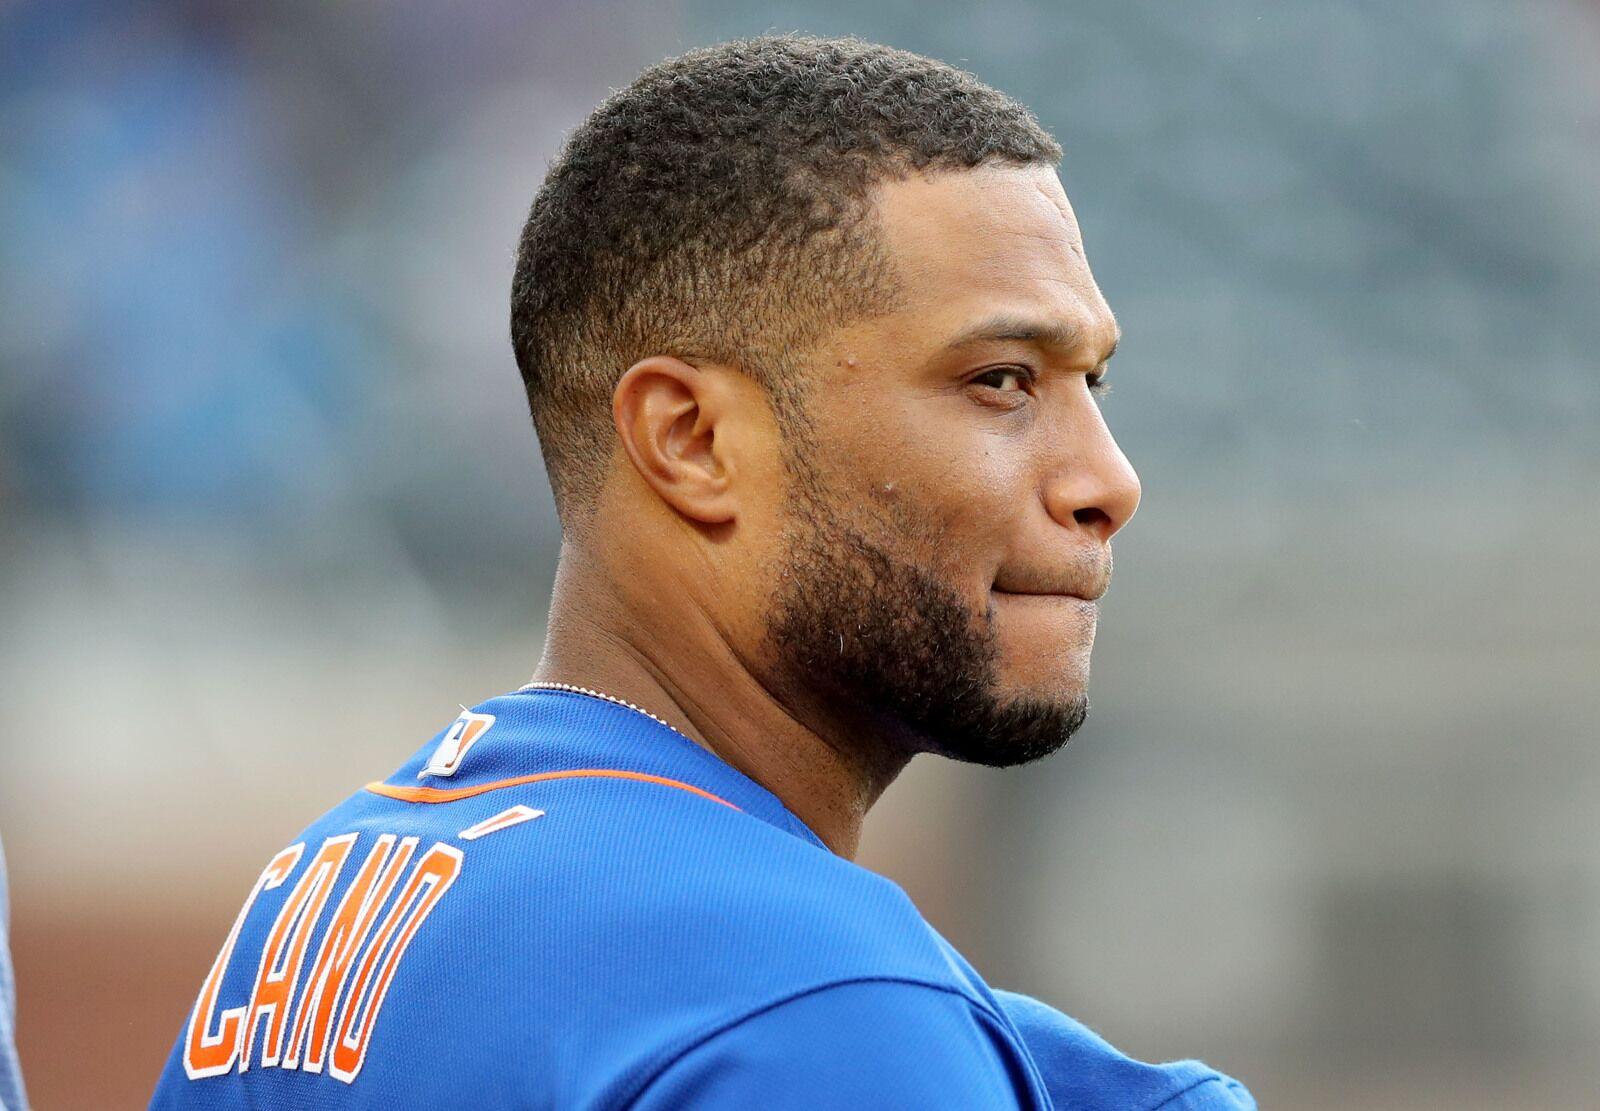 Mets: The Irony Behind Robinson Cano's Injury